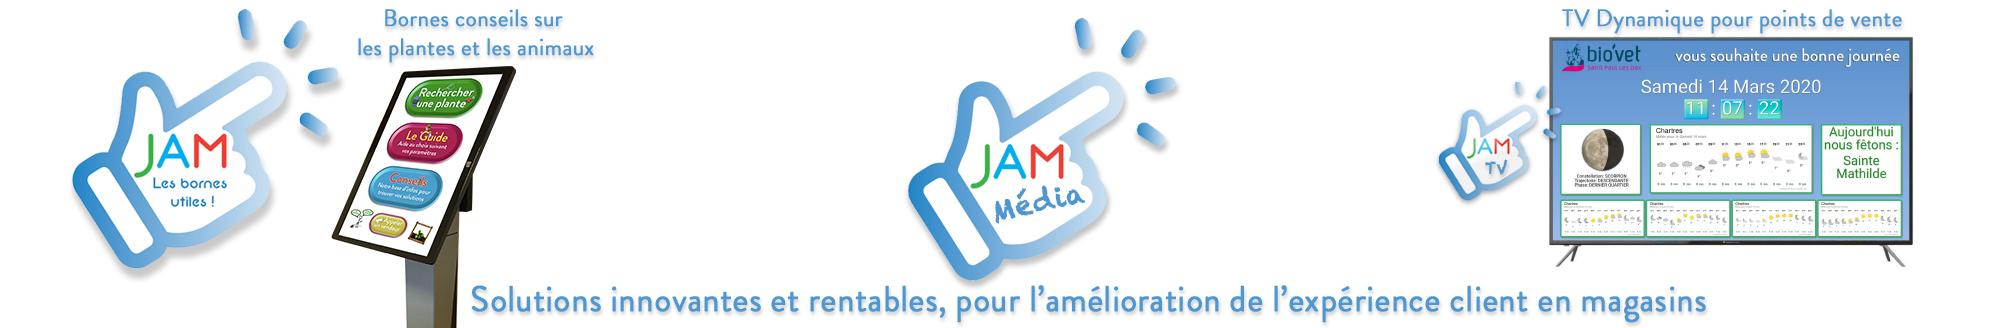 JAM Média